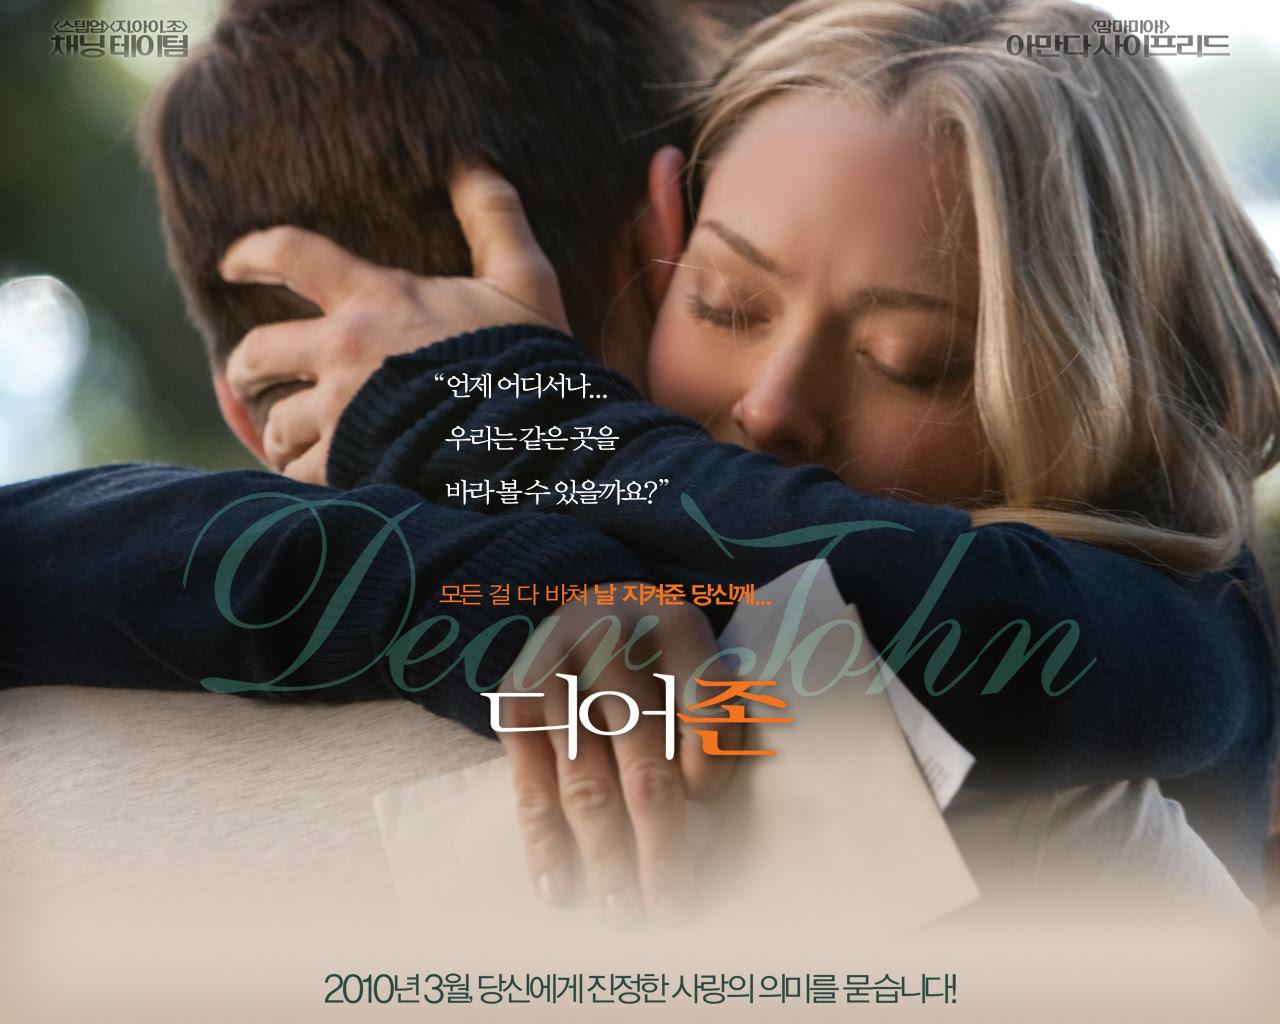 Channing Tatum and Amanda Seyfried in 'Dear John' Wallpapers Korea